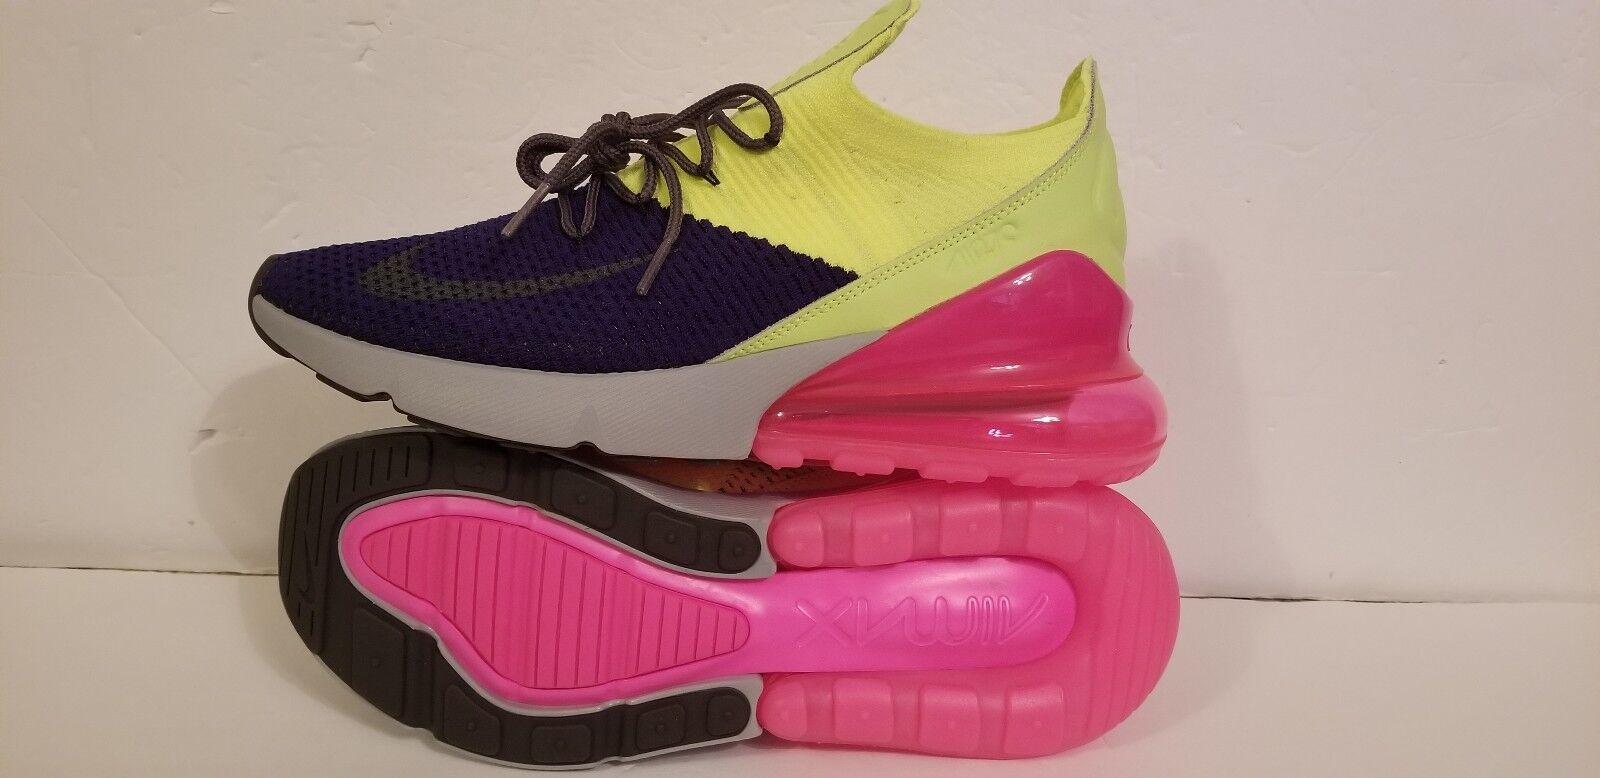 New Nike Air Max 270 Flyknit Regency Purple Grey Volt AO1023-501 Men's Size 10.5